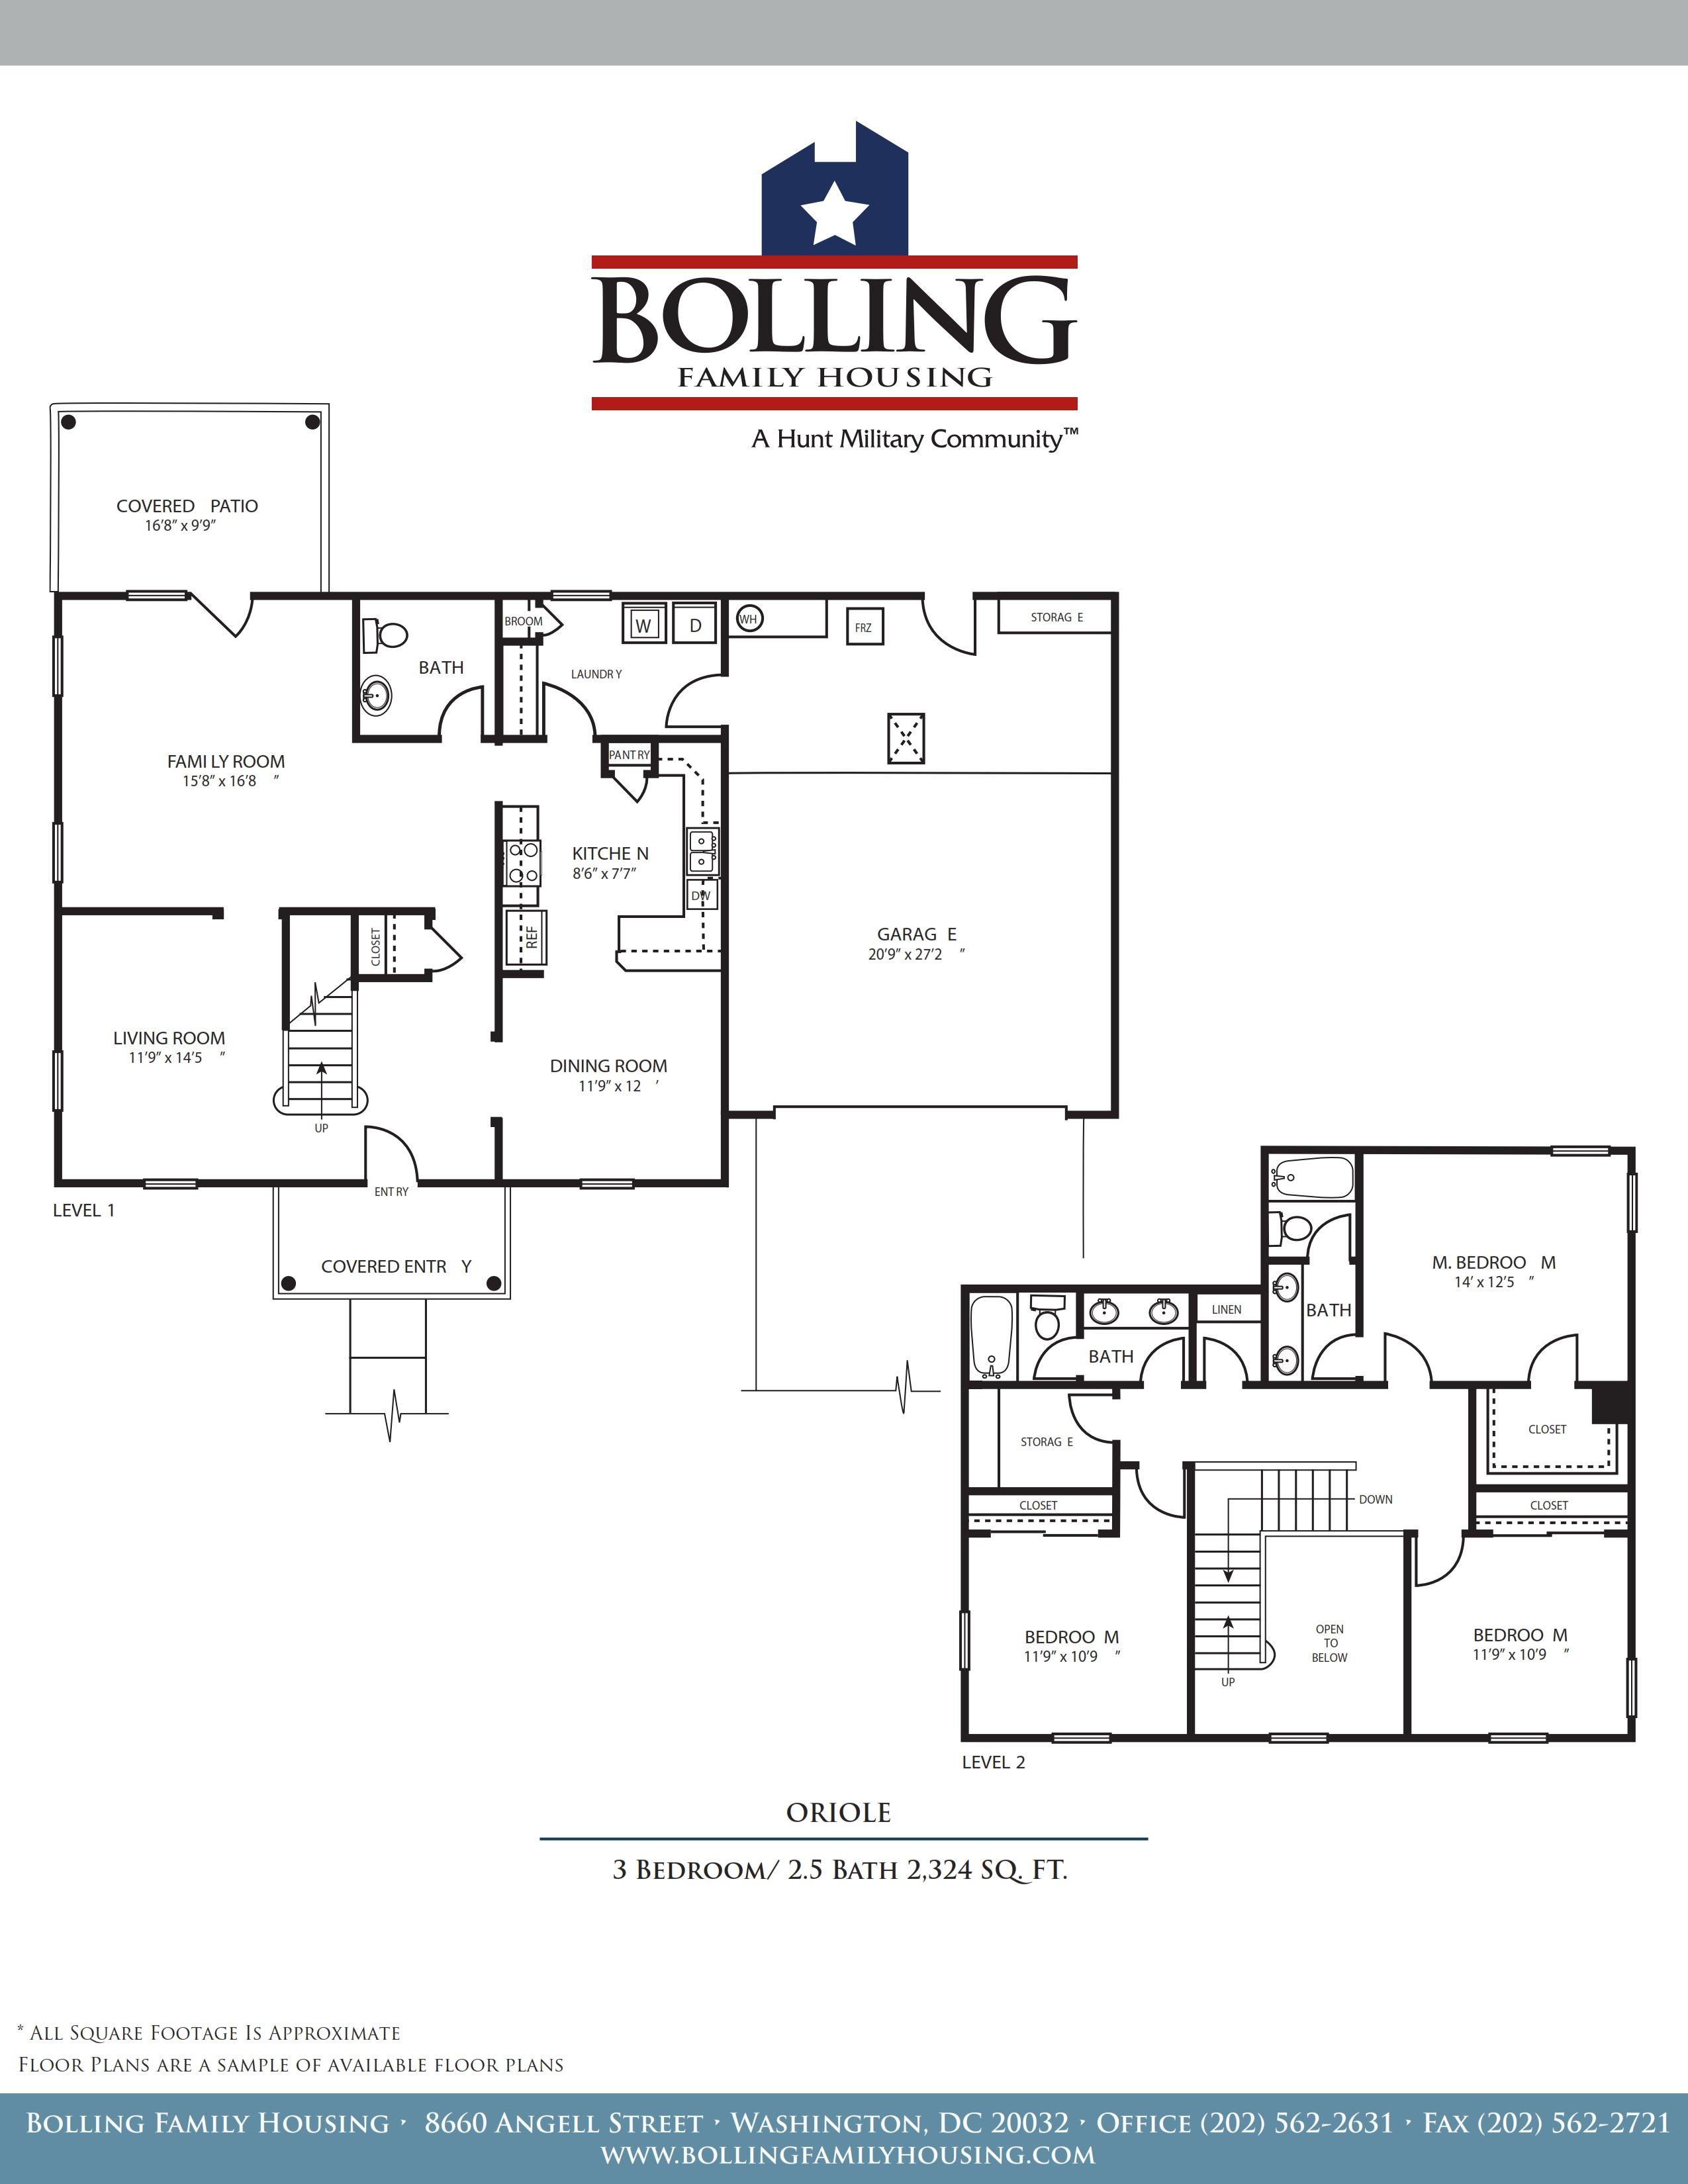 Jb Anacostia Bolling New Hickam Village Oriole Floor Plan 3 Bedroom 2 5 Bathroom 2324 Sq Ft